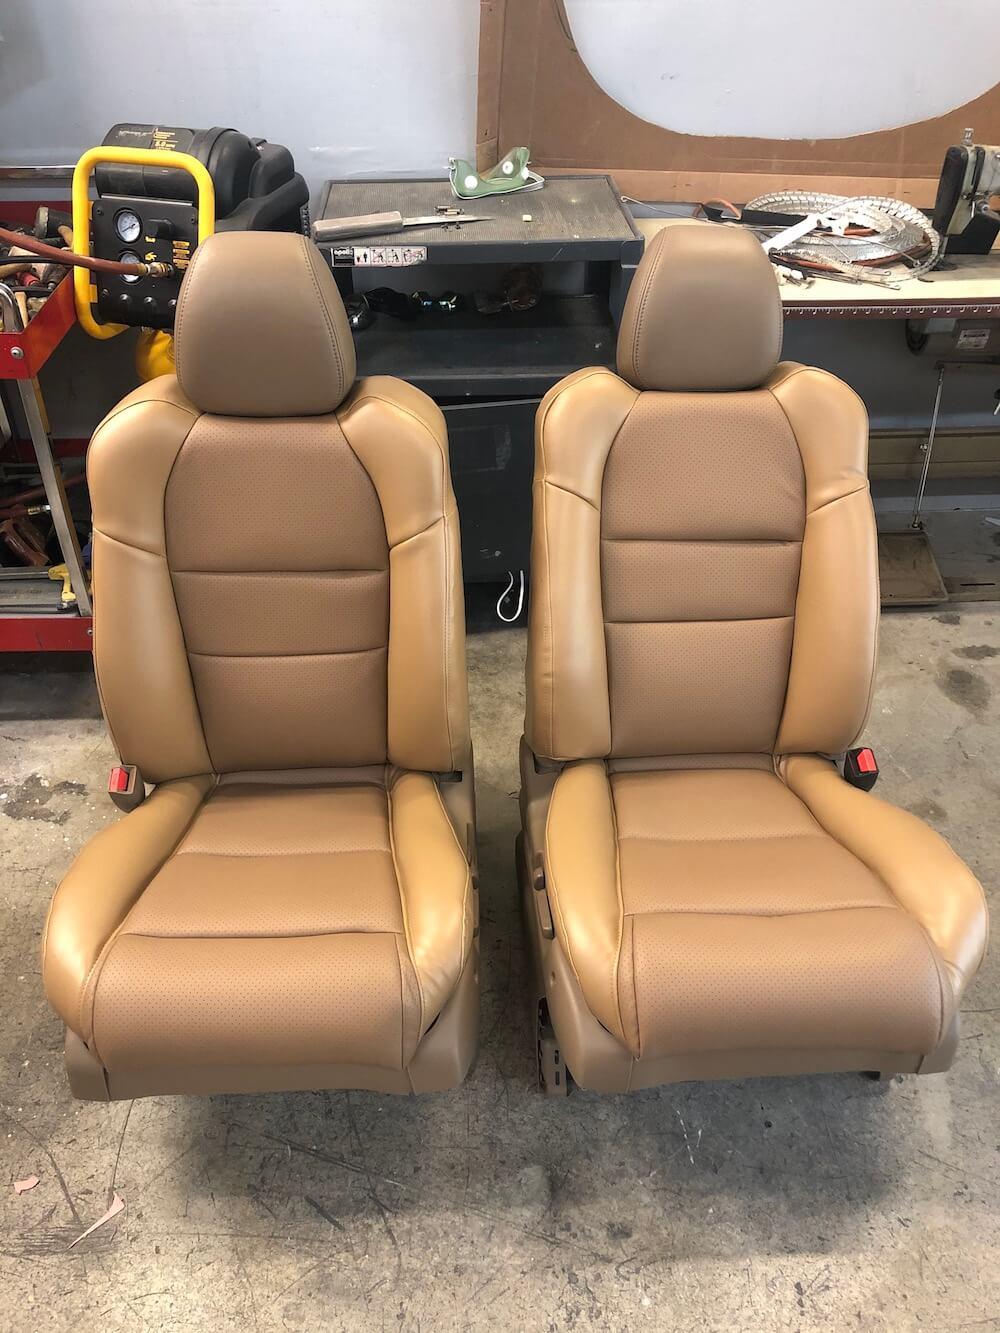 Reupholstered Car Seats